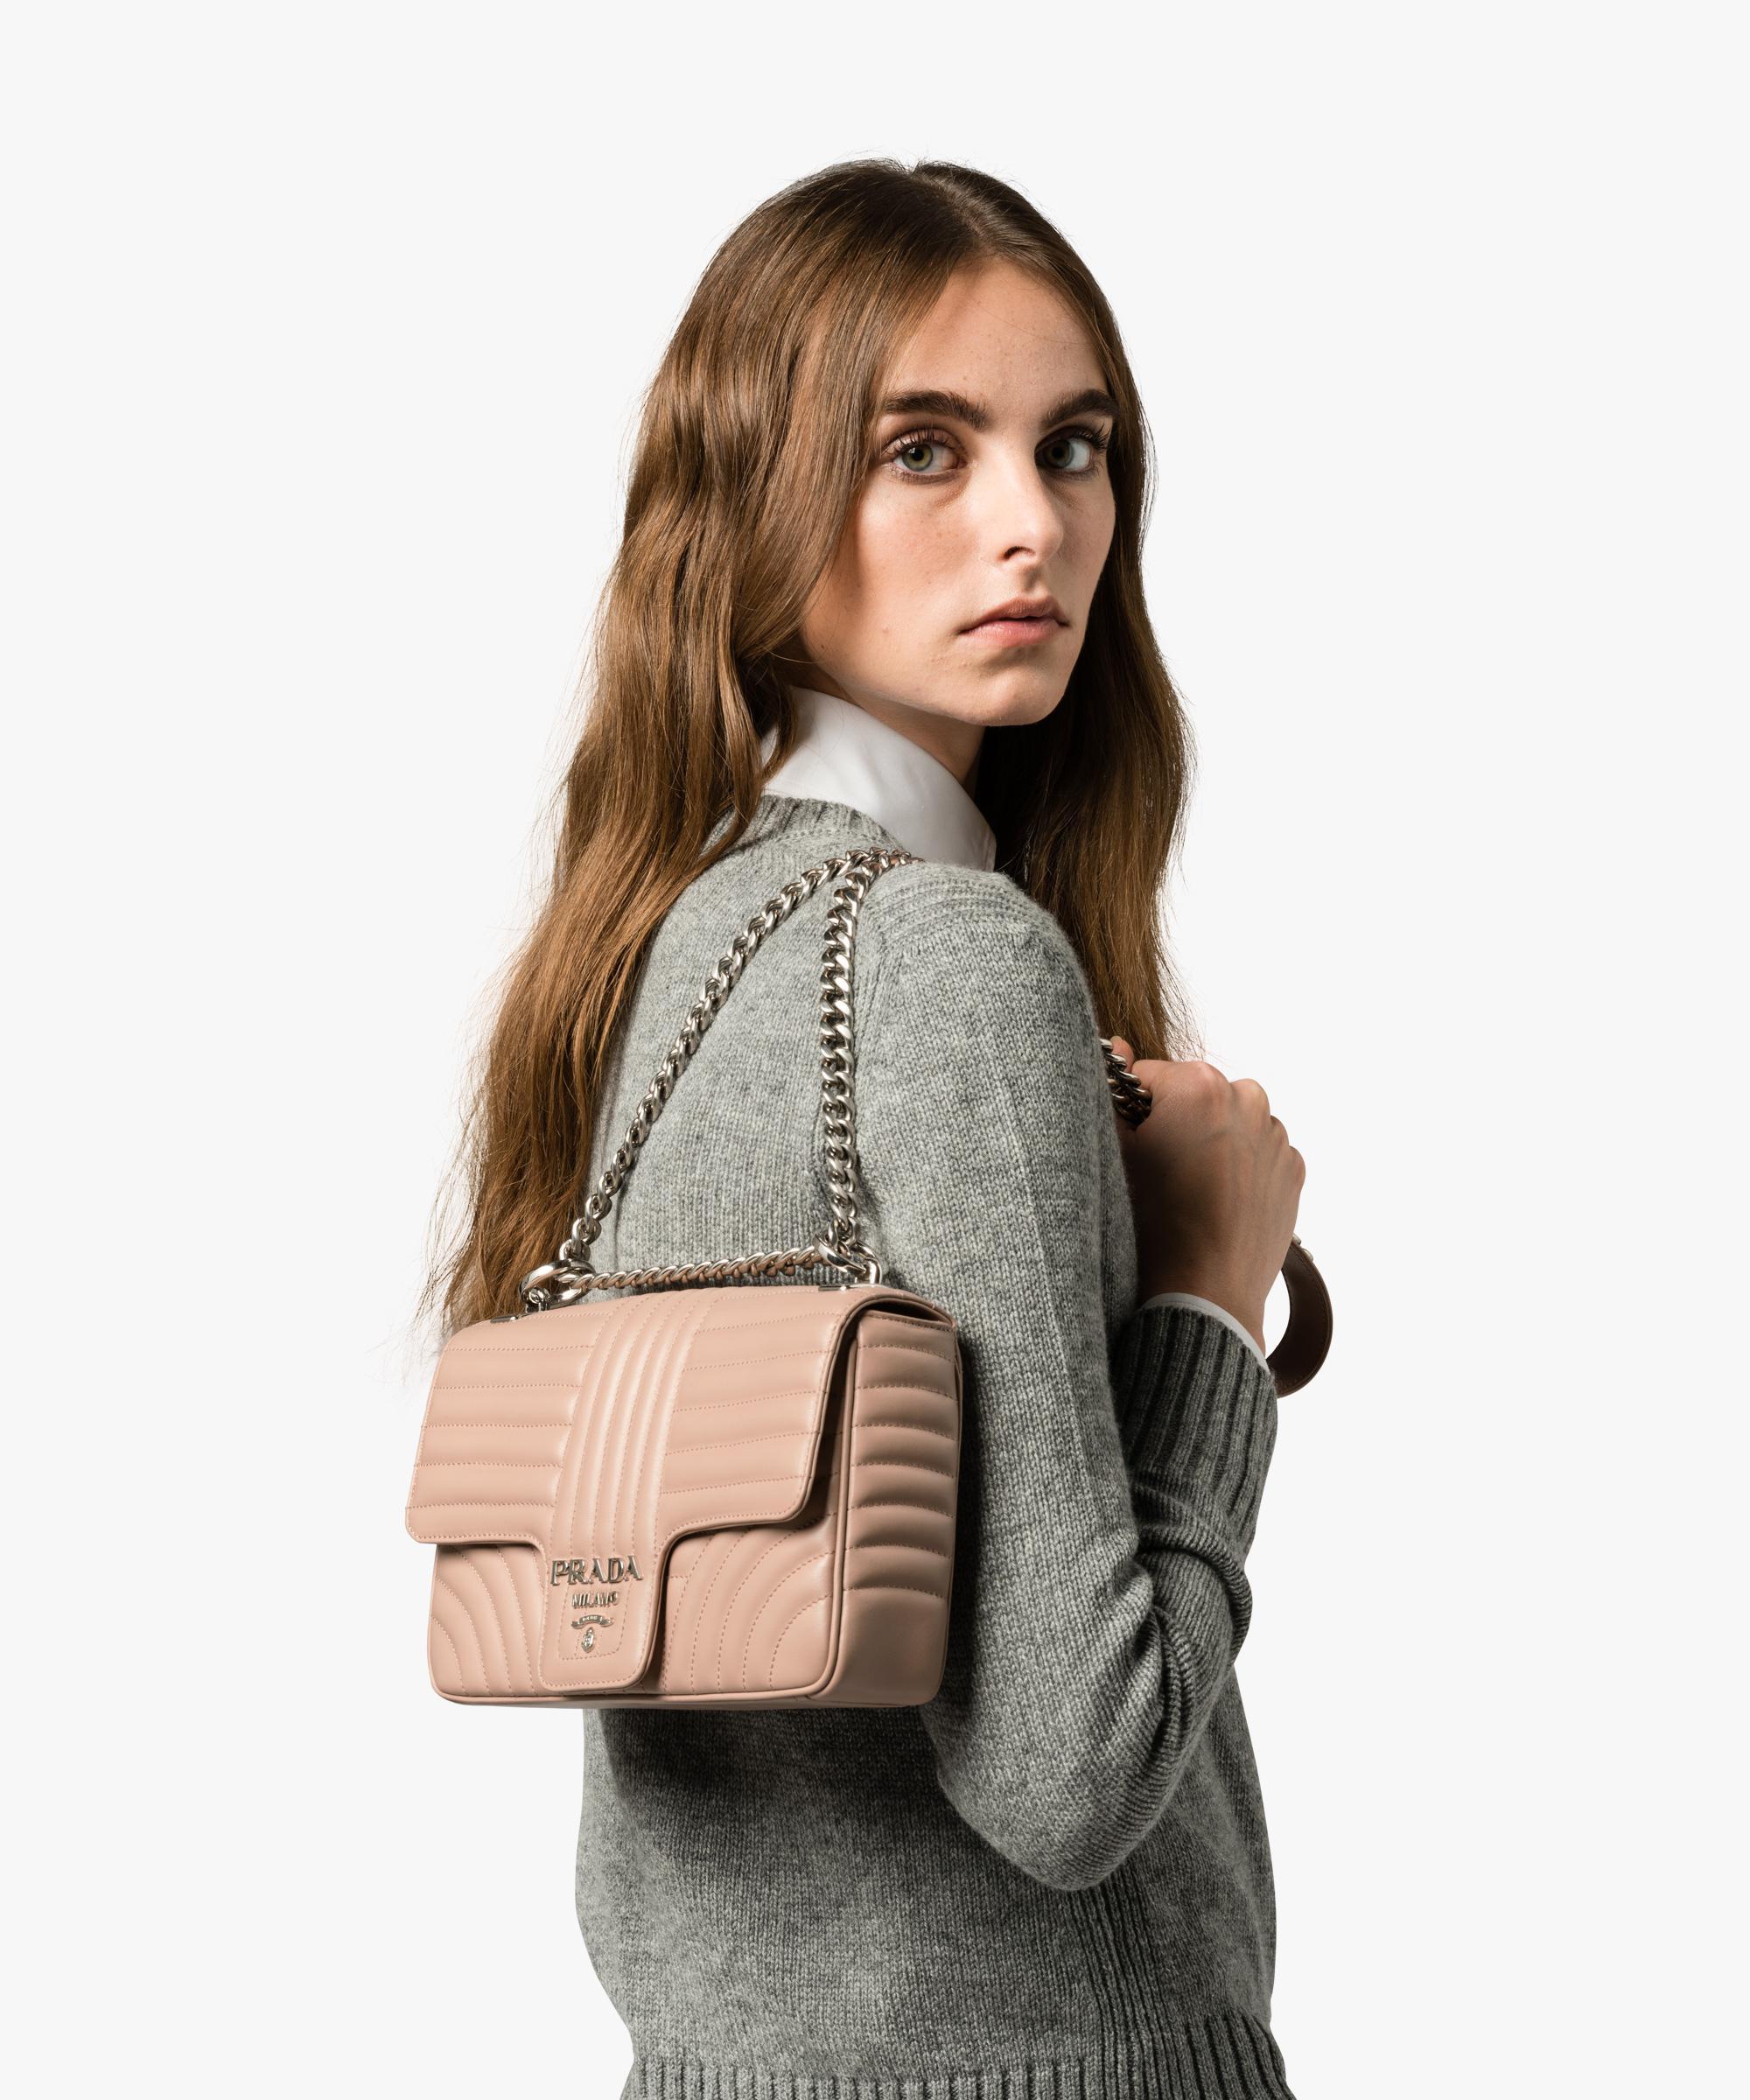 7d518df82058 Prada Diagramme Leather Shoulder Bag - Lyst